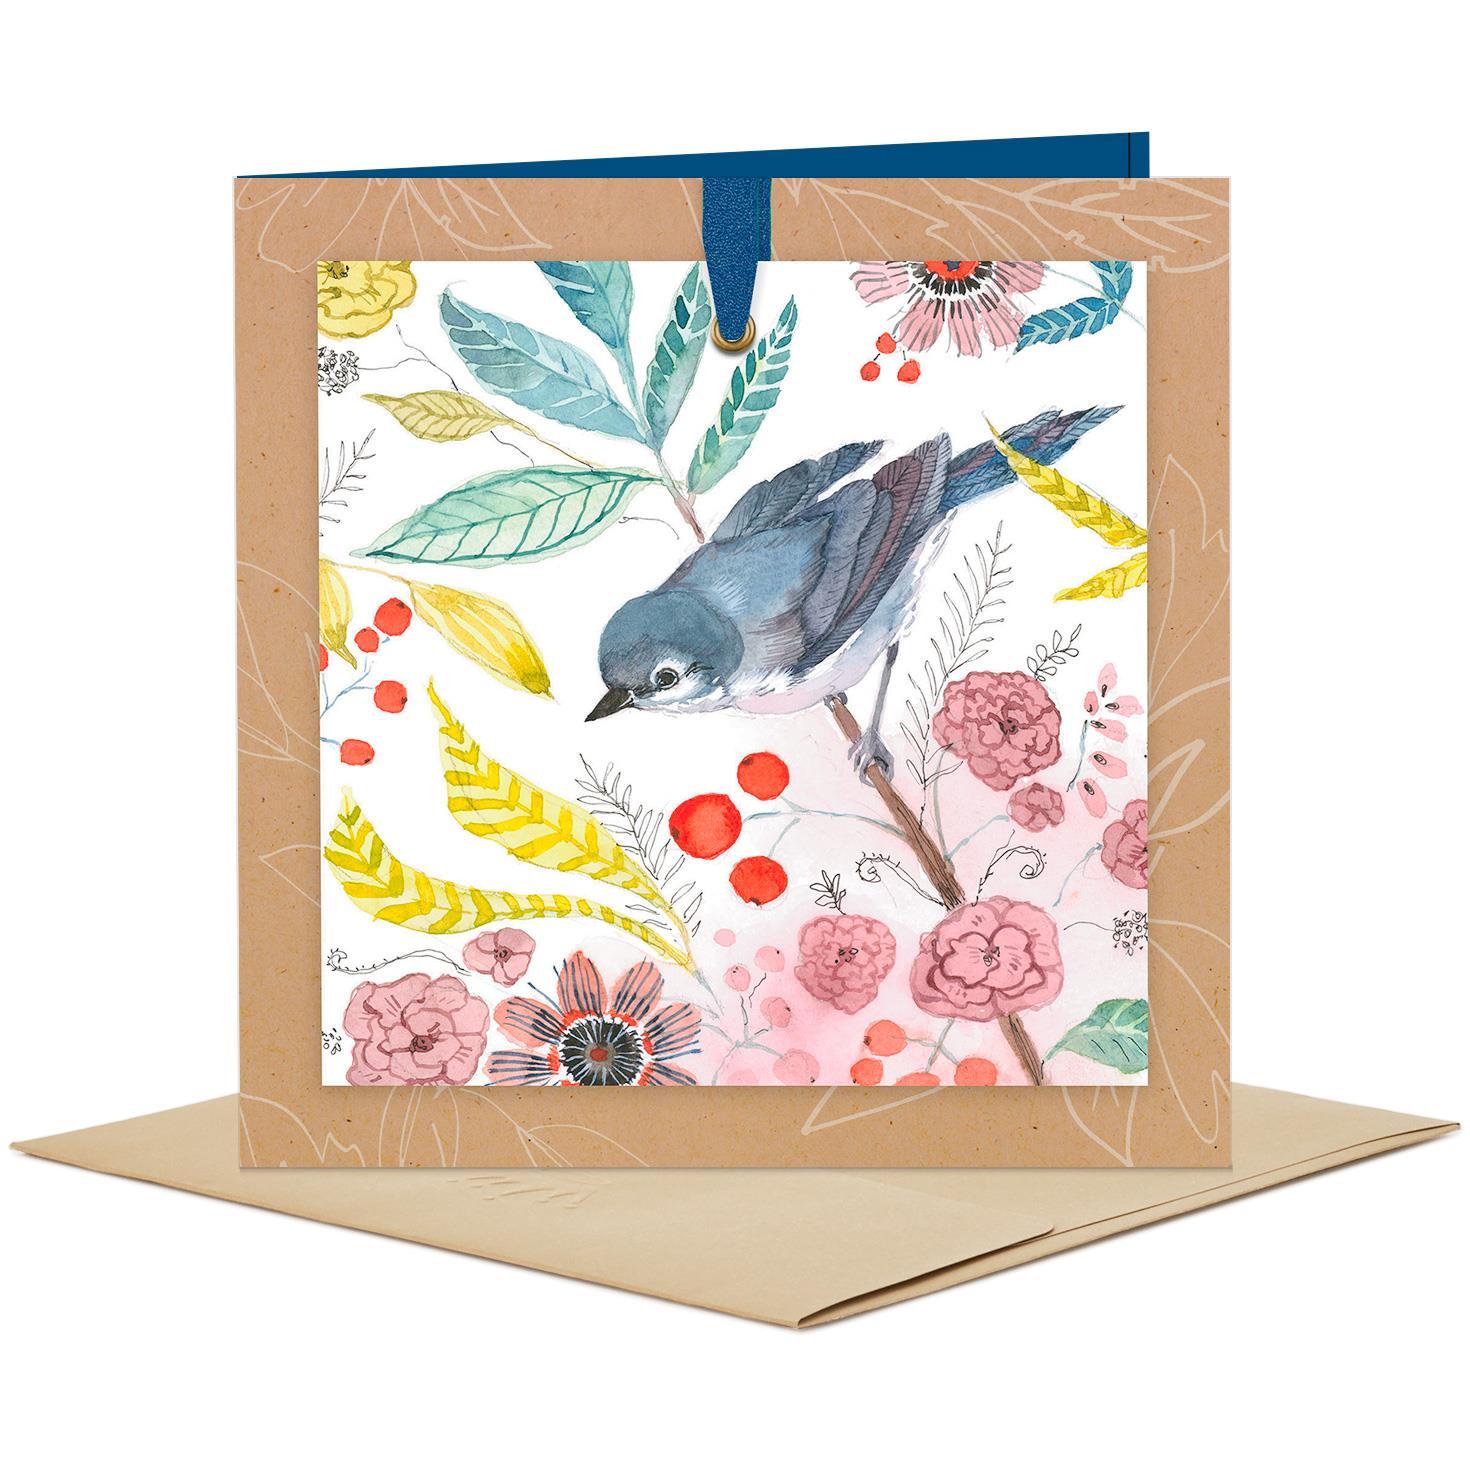 Bluebird And Flowers Blank Card Greeting Cards Hallmark